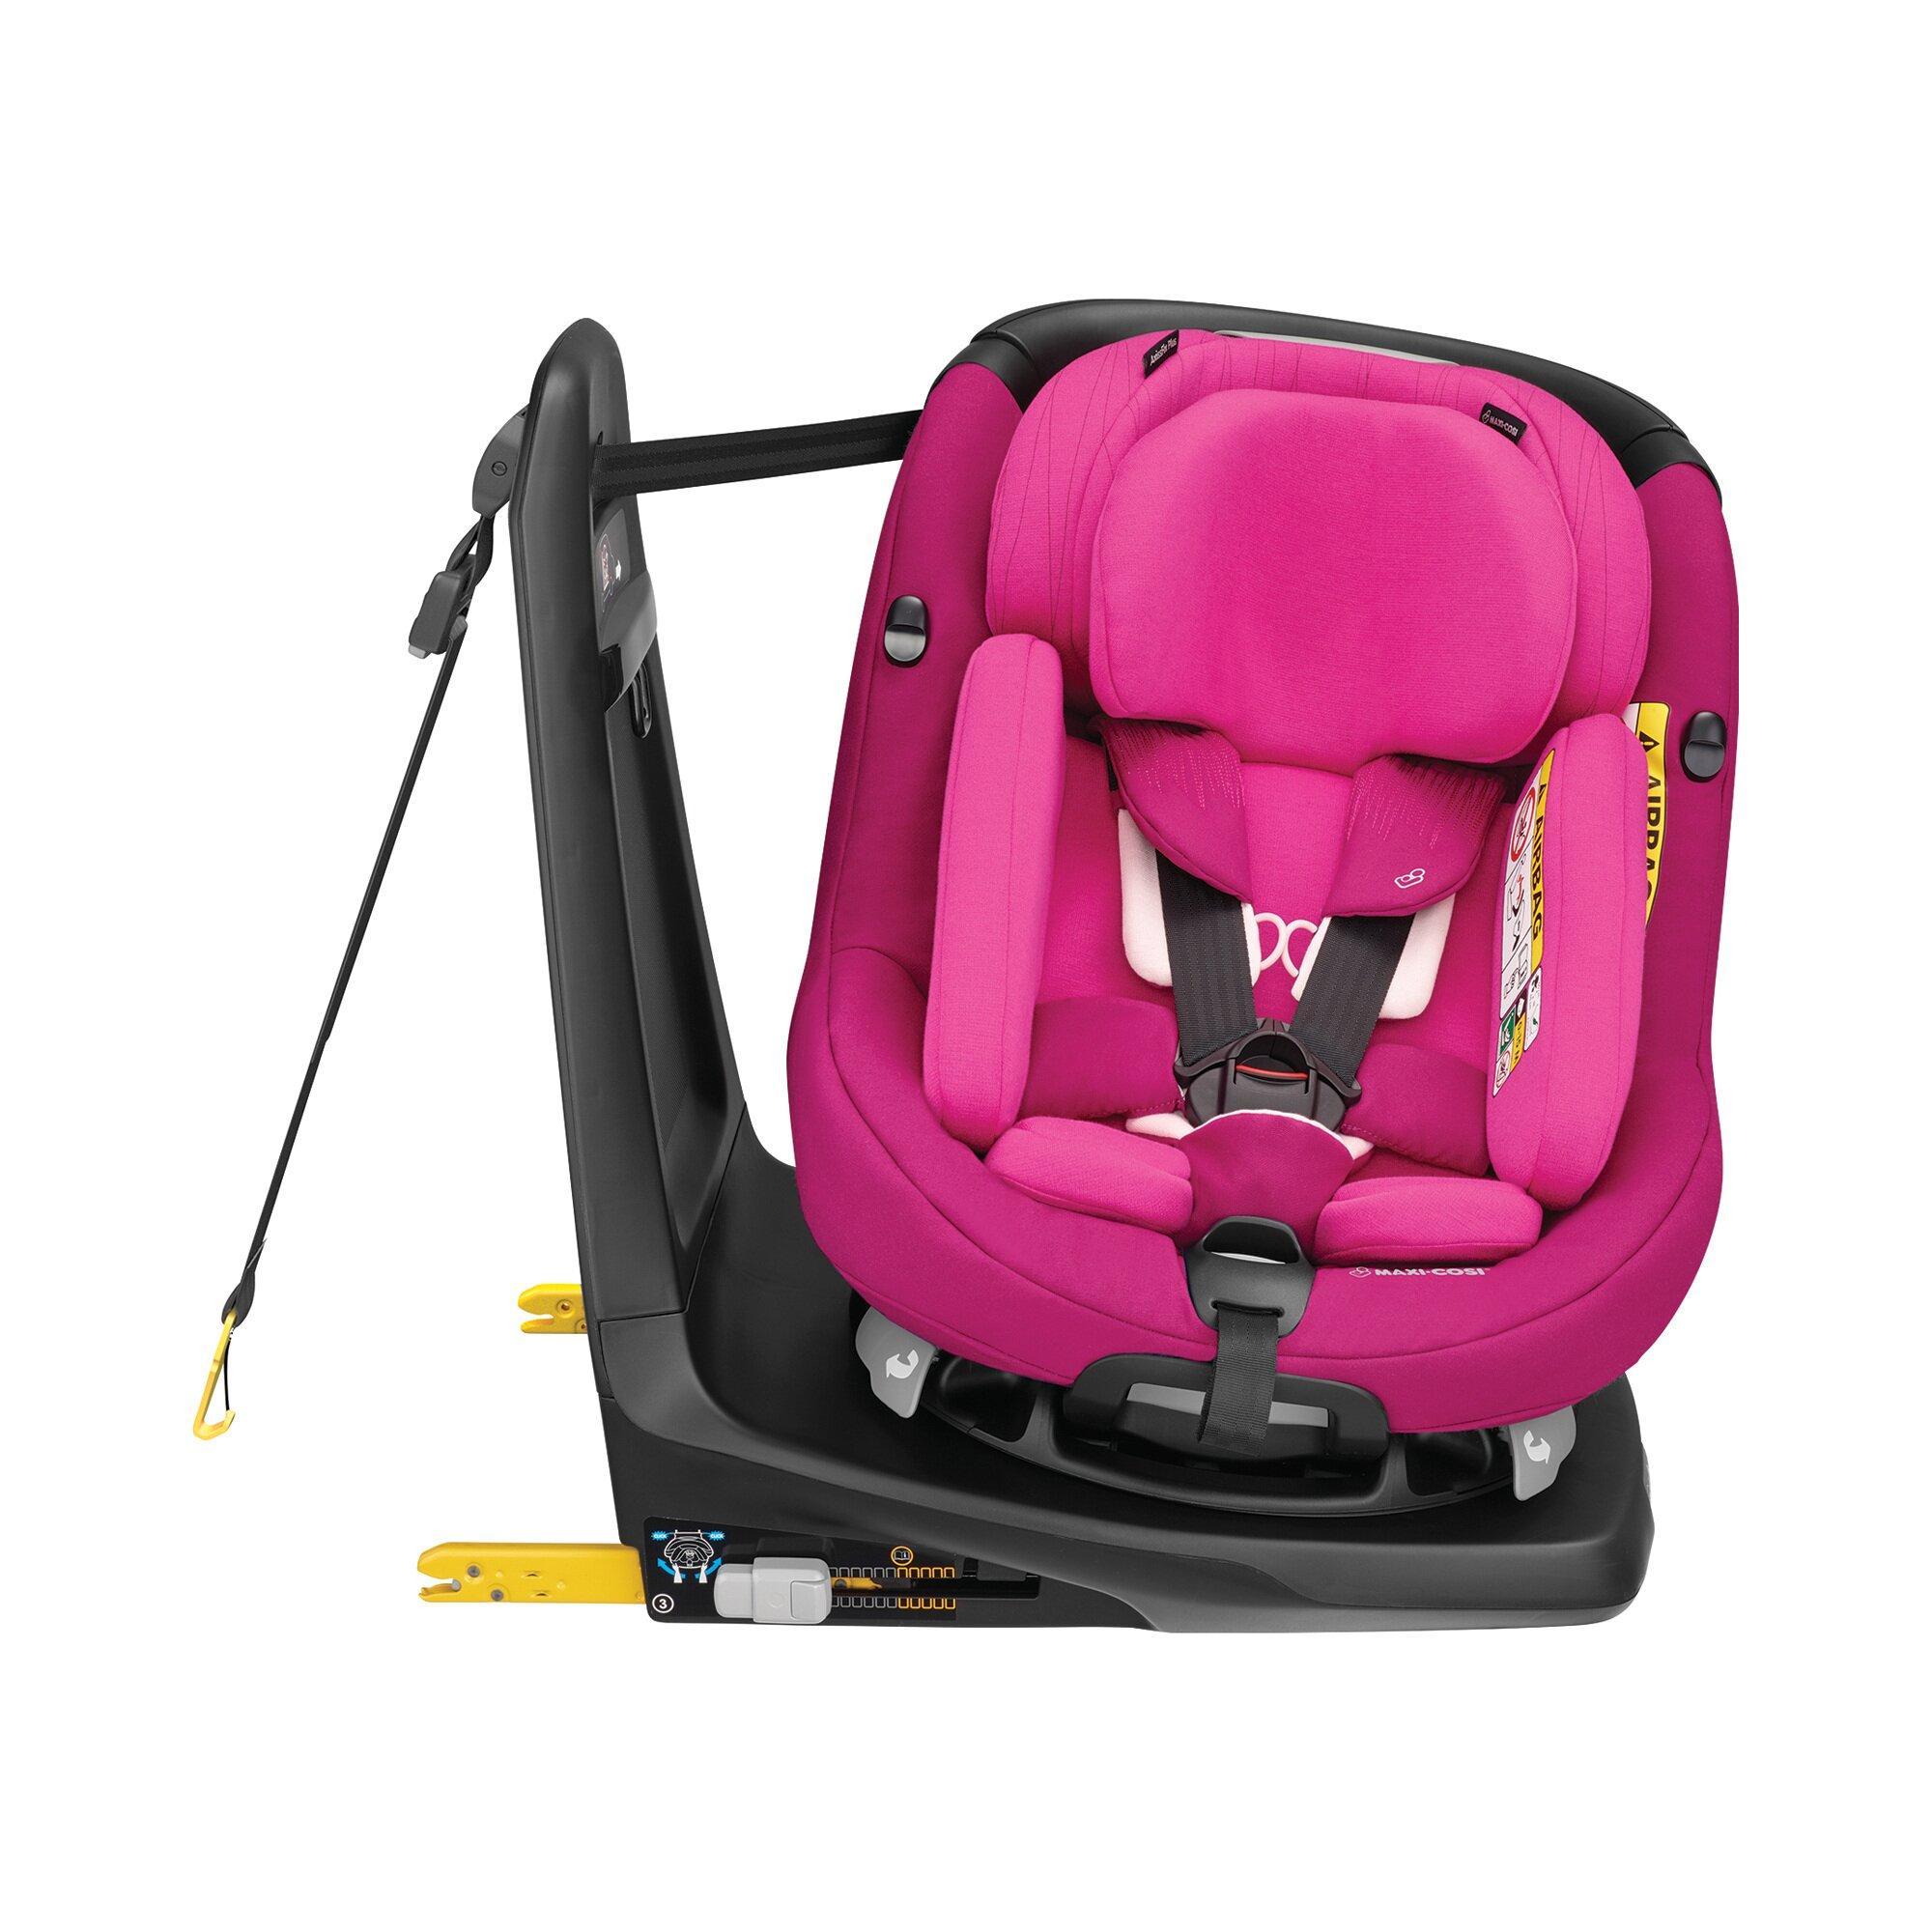 axissfix-plus-kindersitz-design-2018-pink